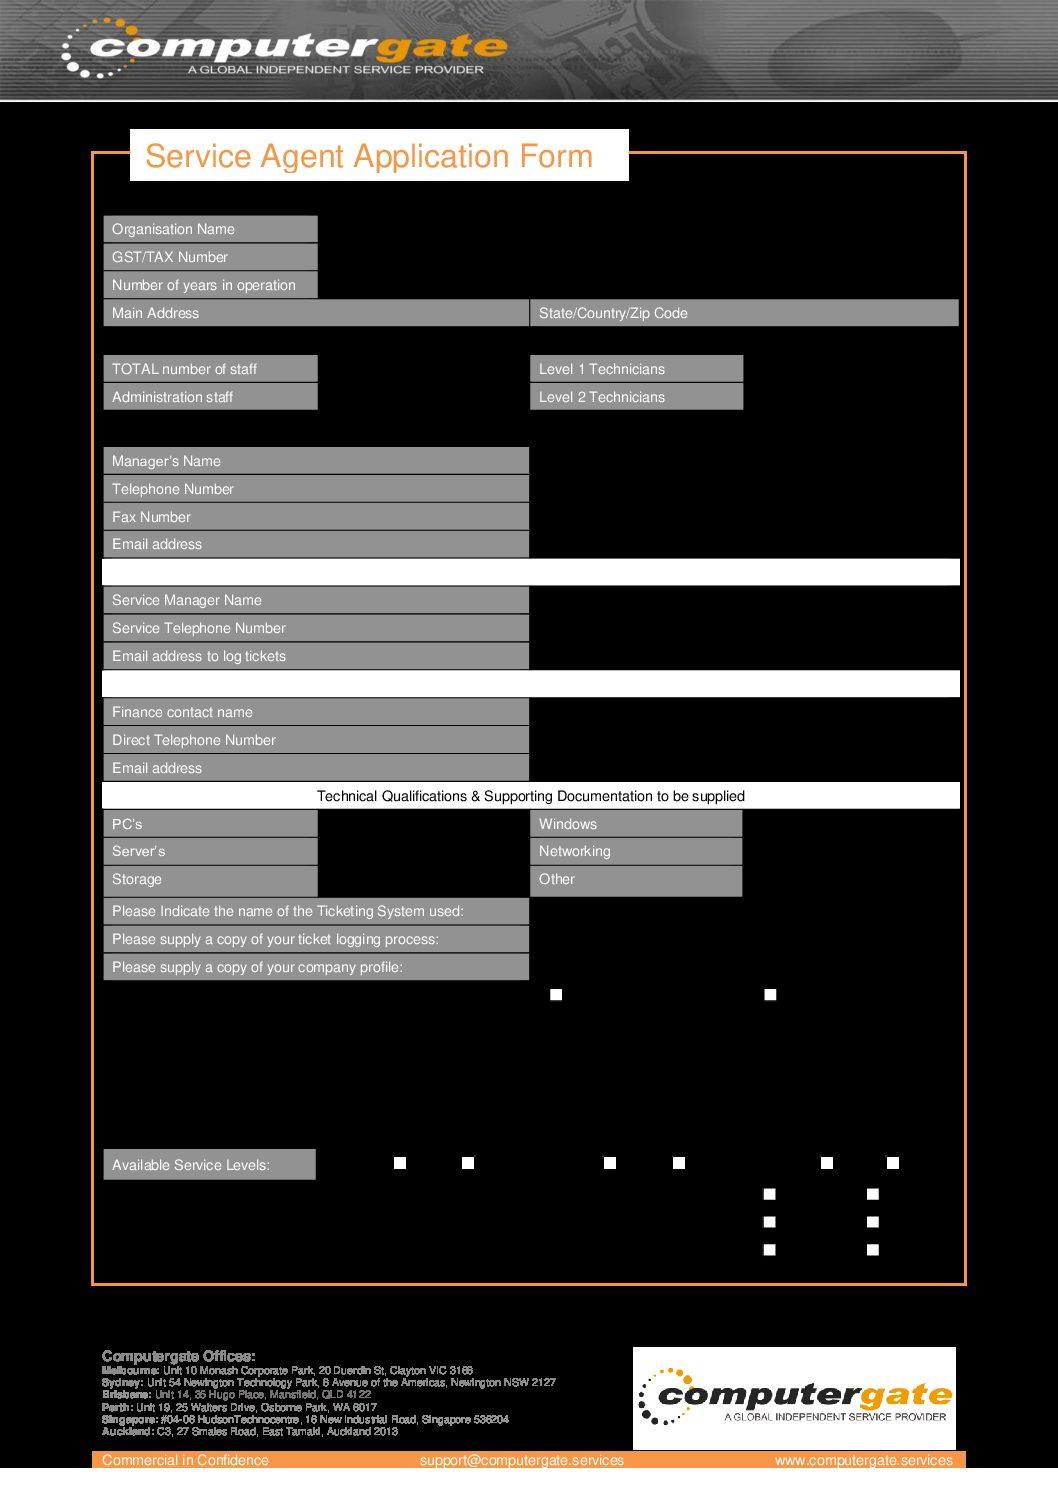 Service Agent Application Form – 2020